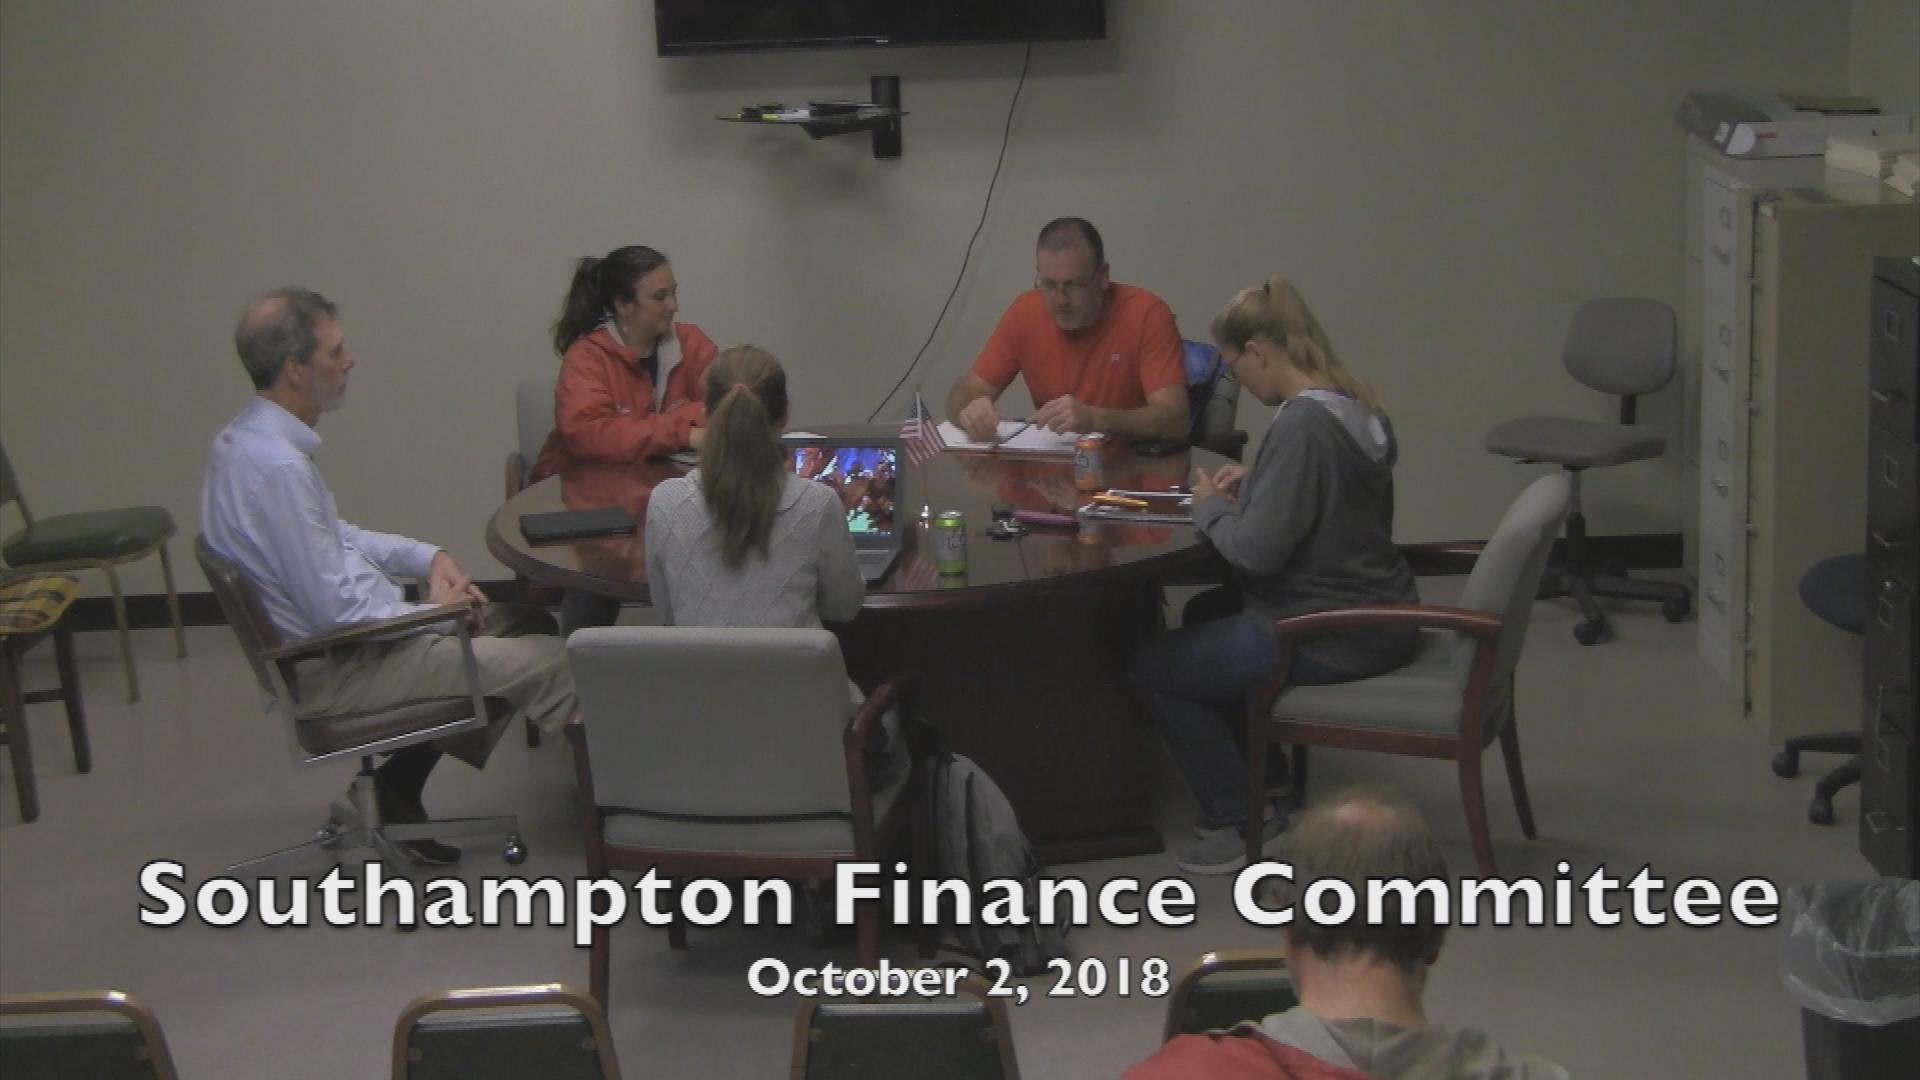 Southampton Finance Committee 10.2.18